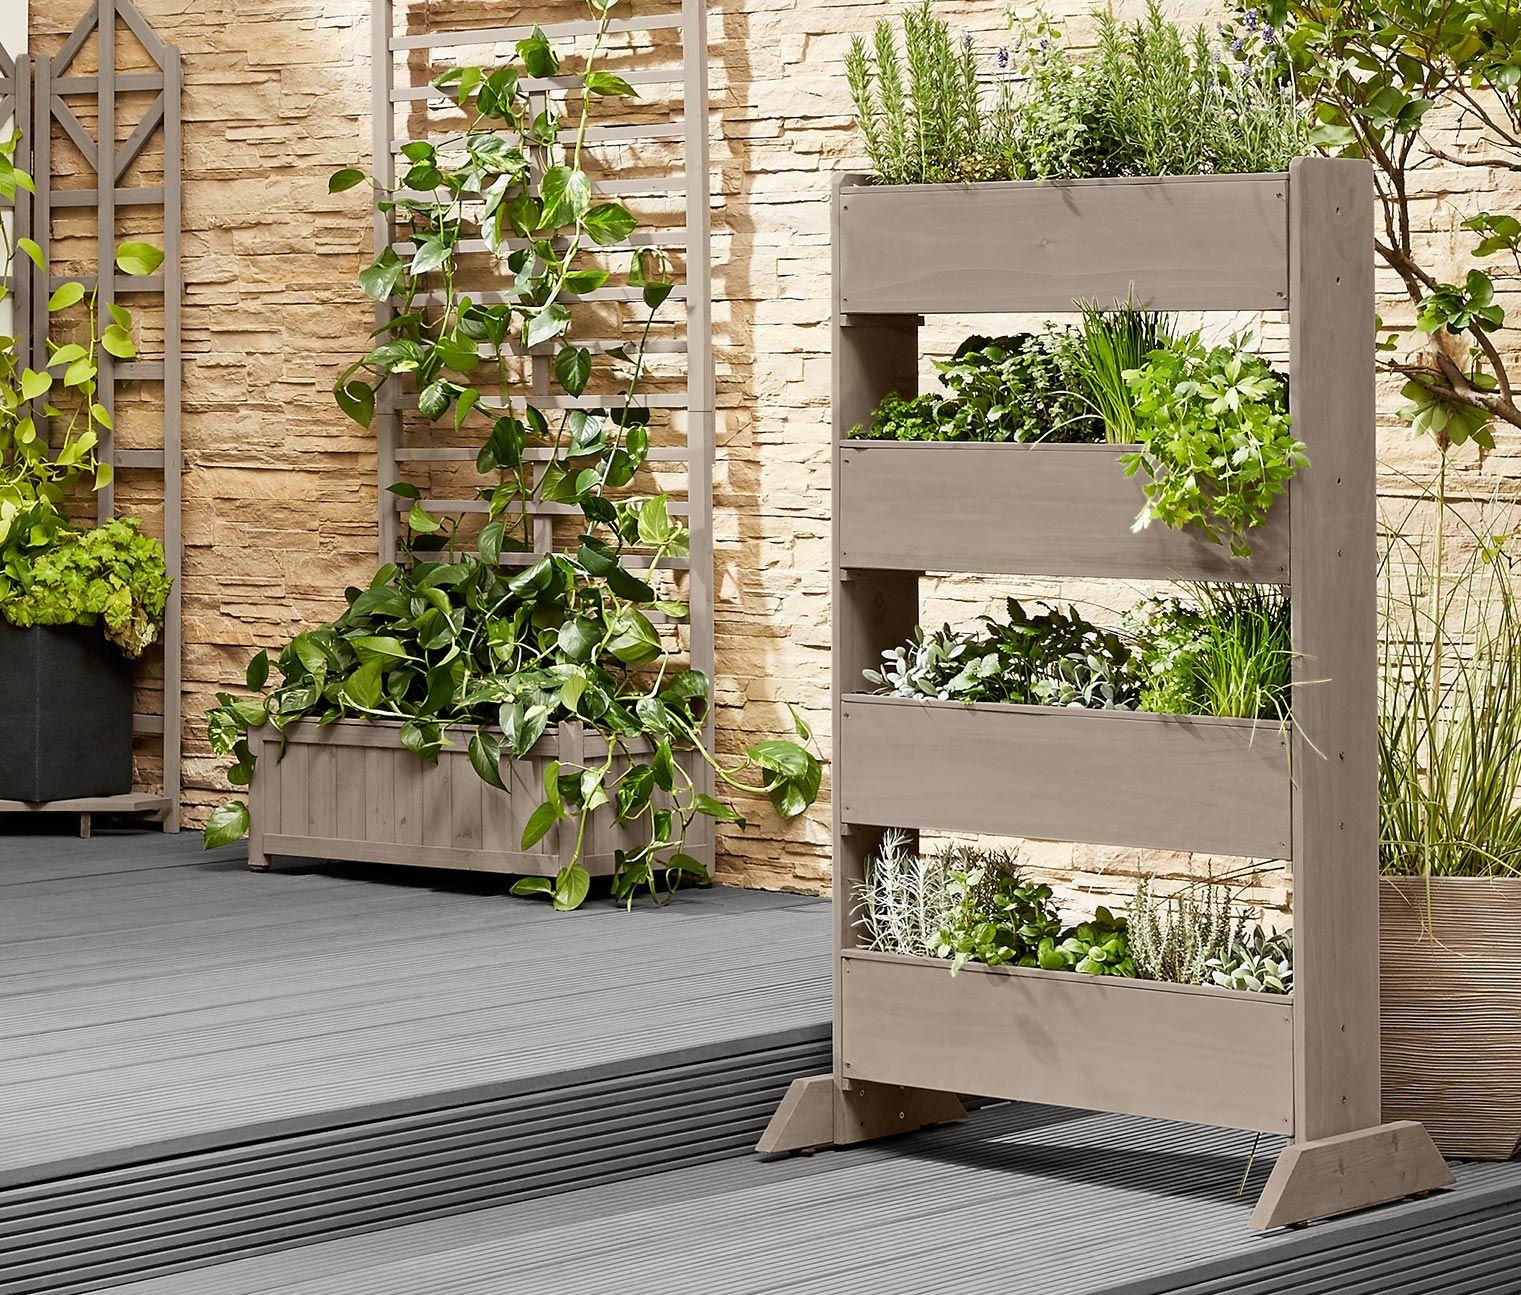 Ladder Decor Garden Outdoor